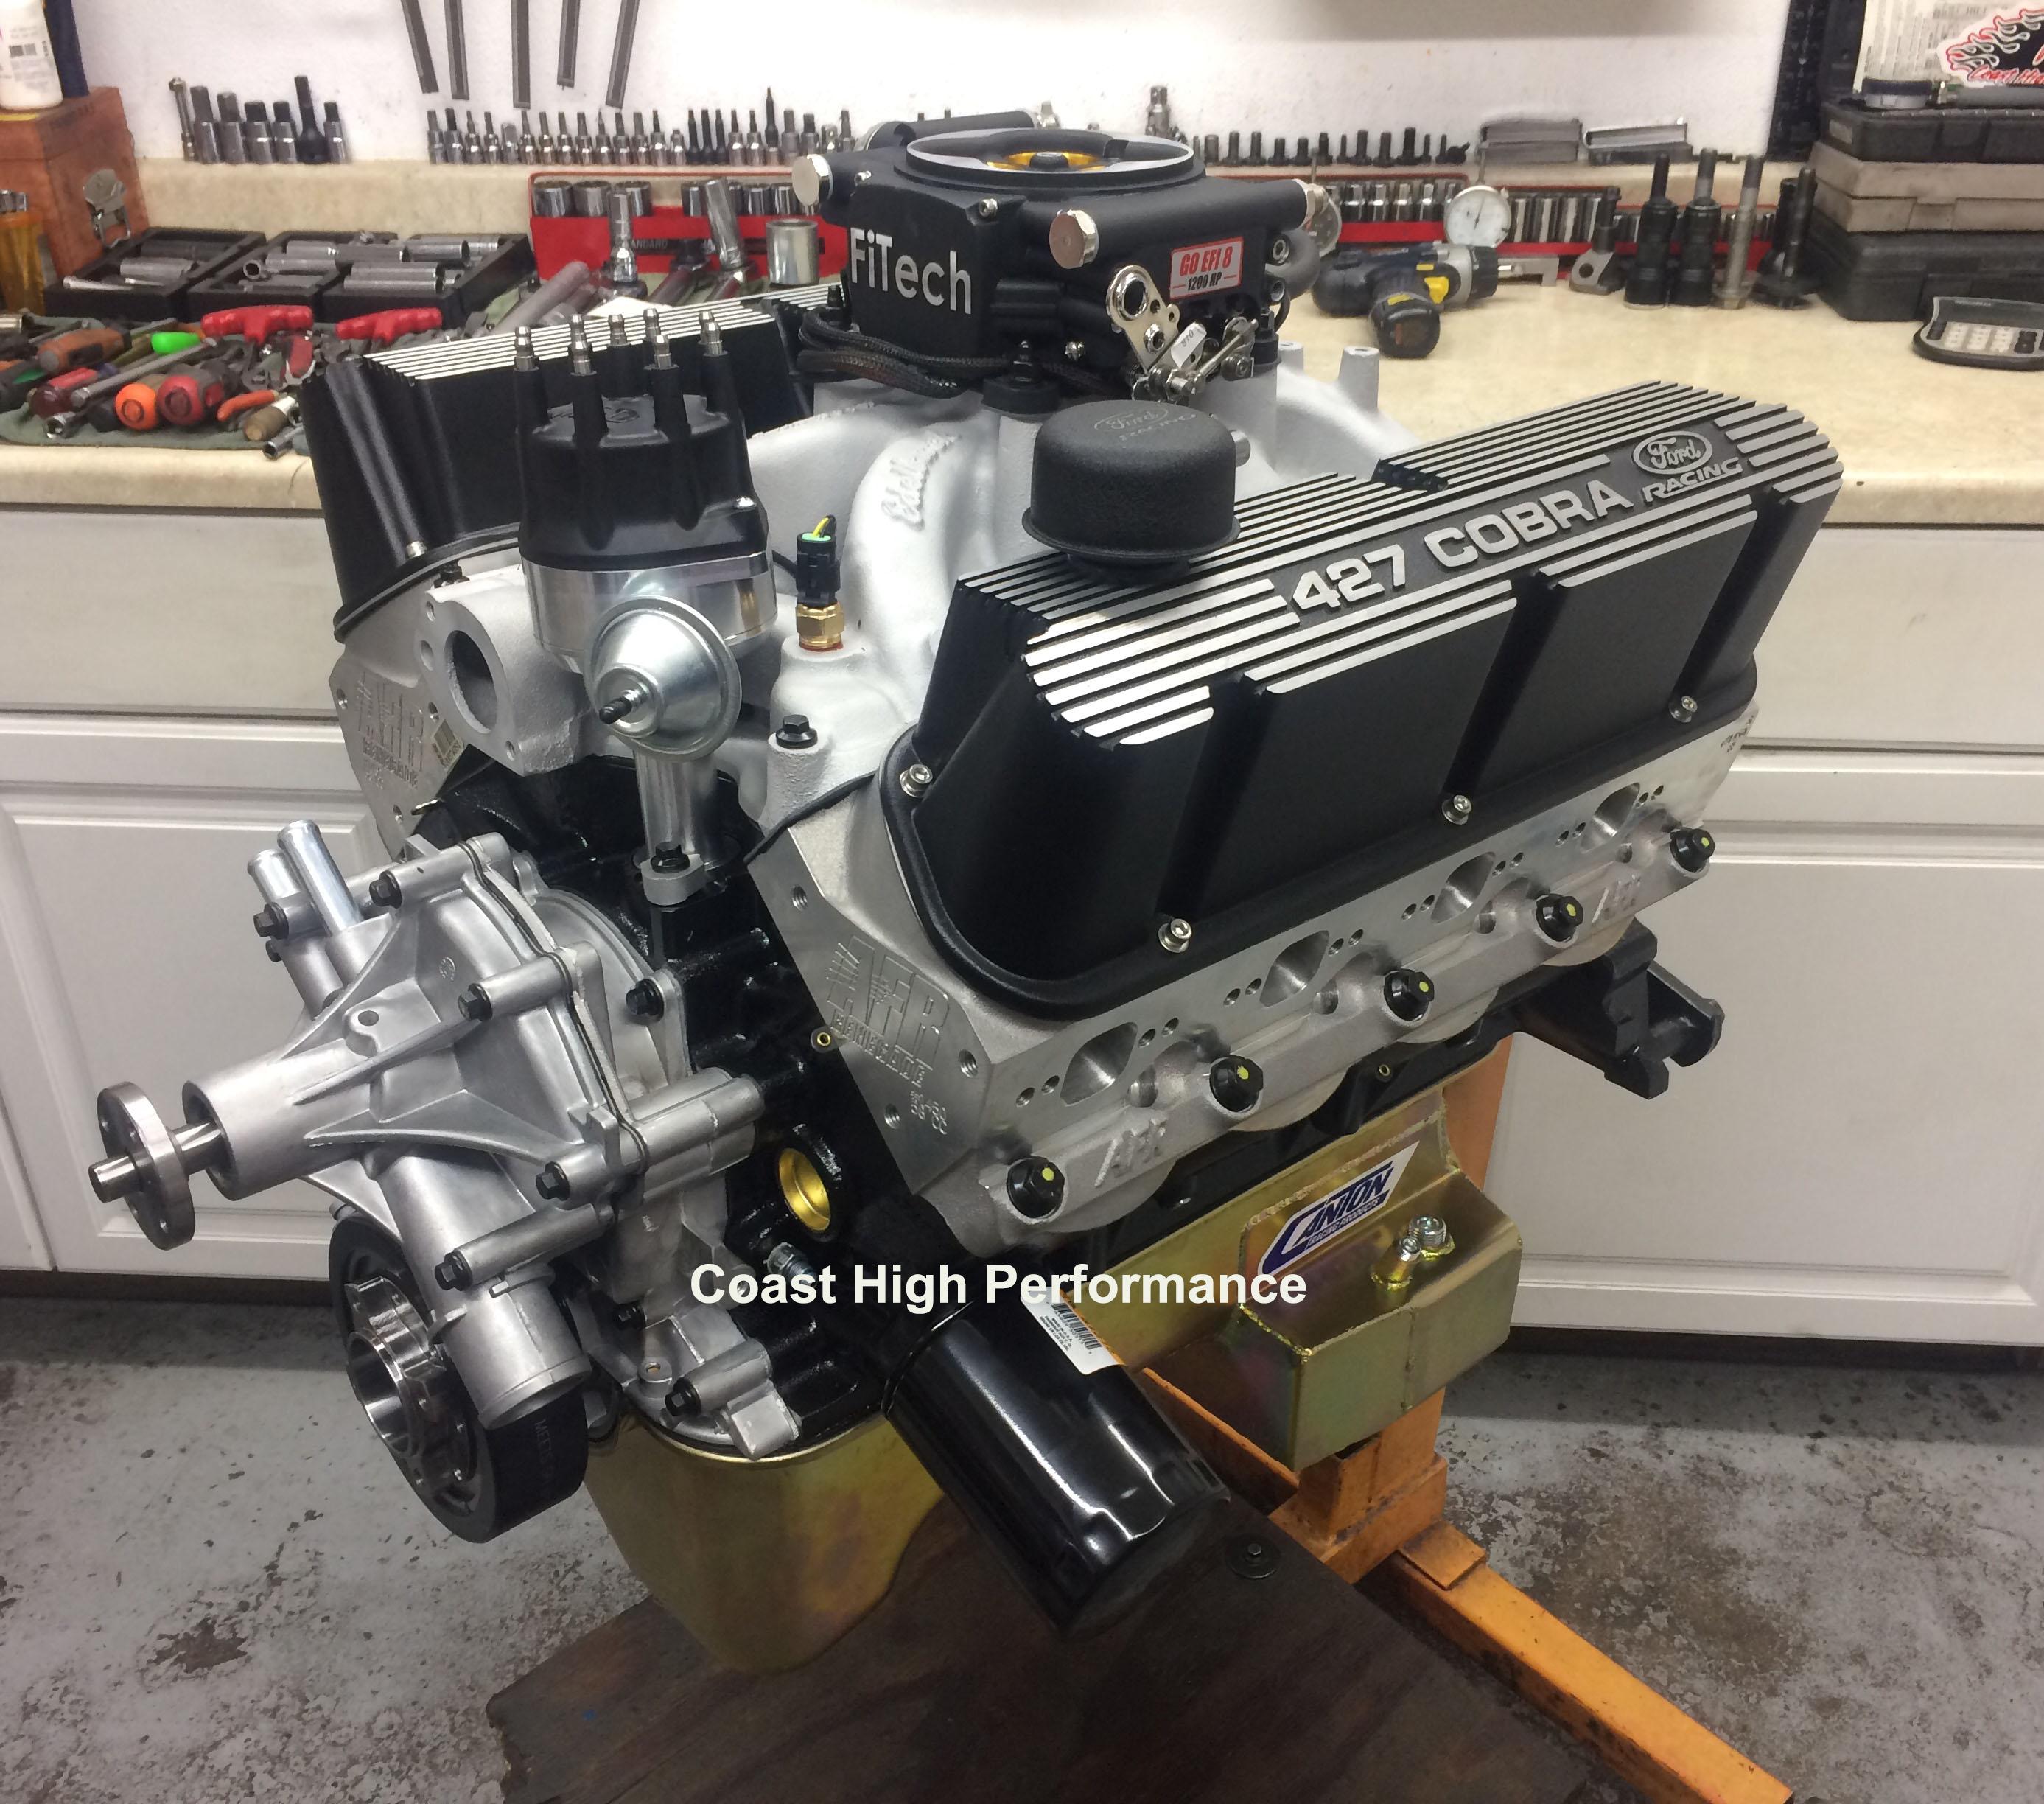 Oldsmobile Supercharger Kits: High Performance Horsepower